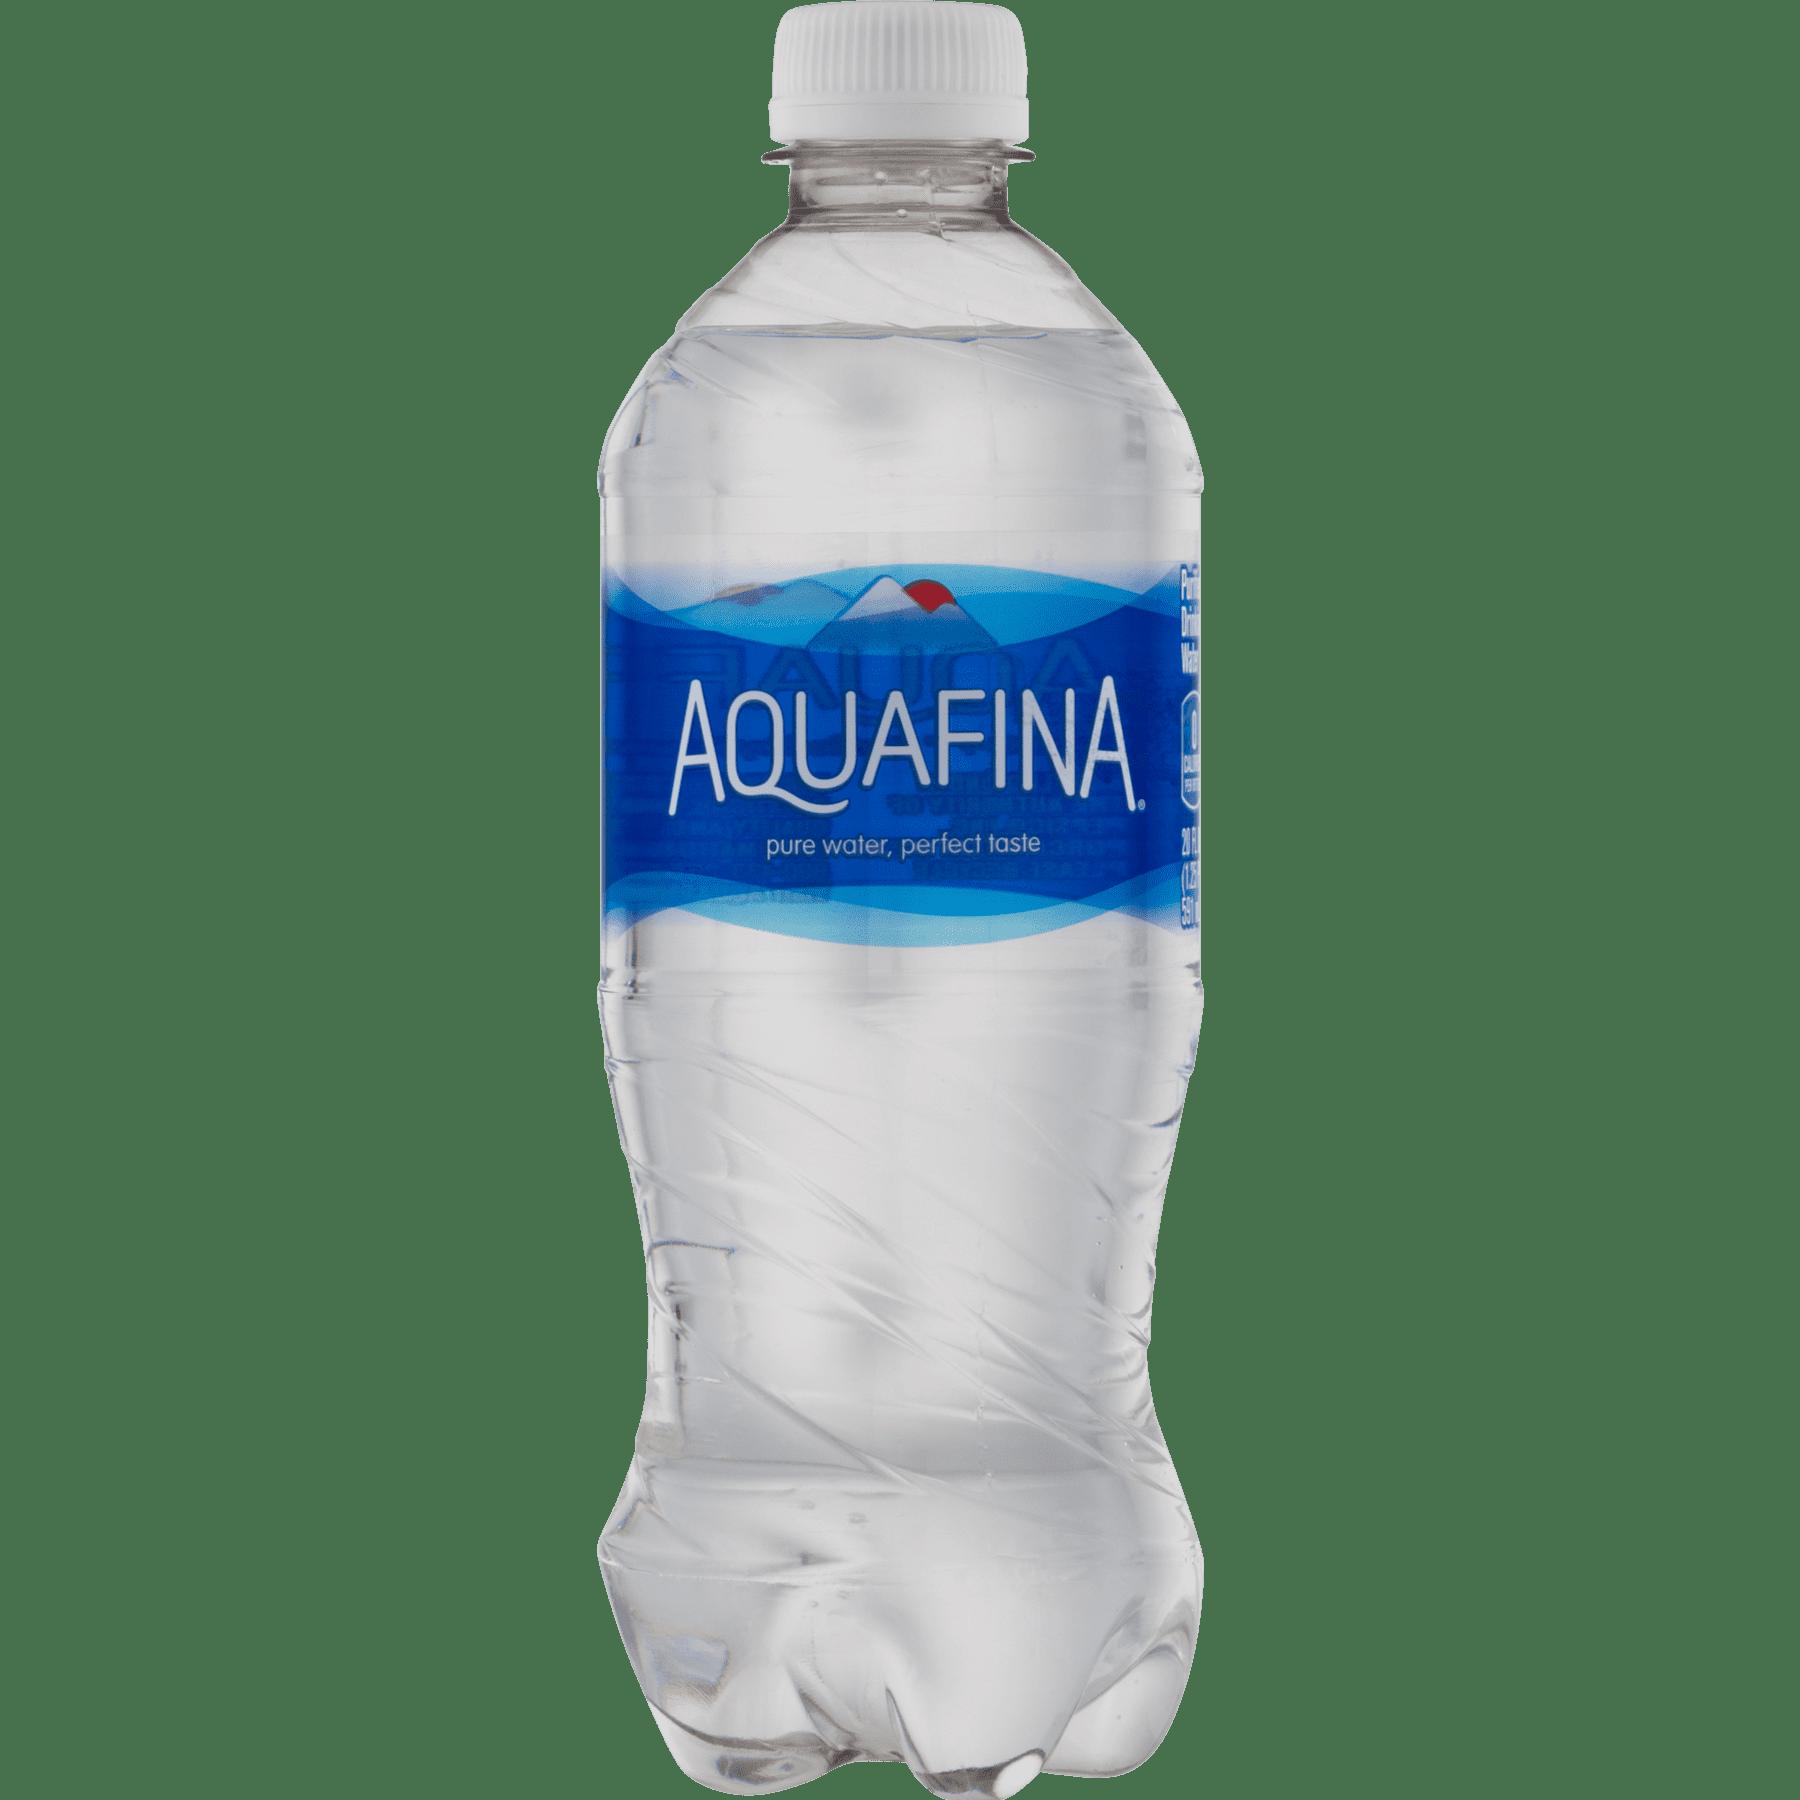 67a324541e Aquafina Purified Drinking Water, 20 Fl. Oz. - Walmart.com